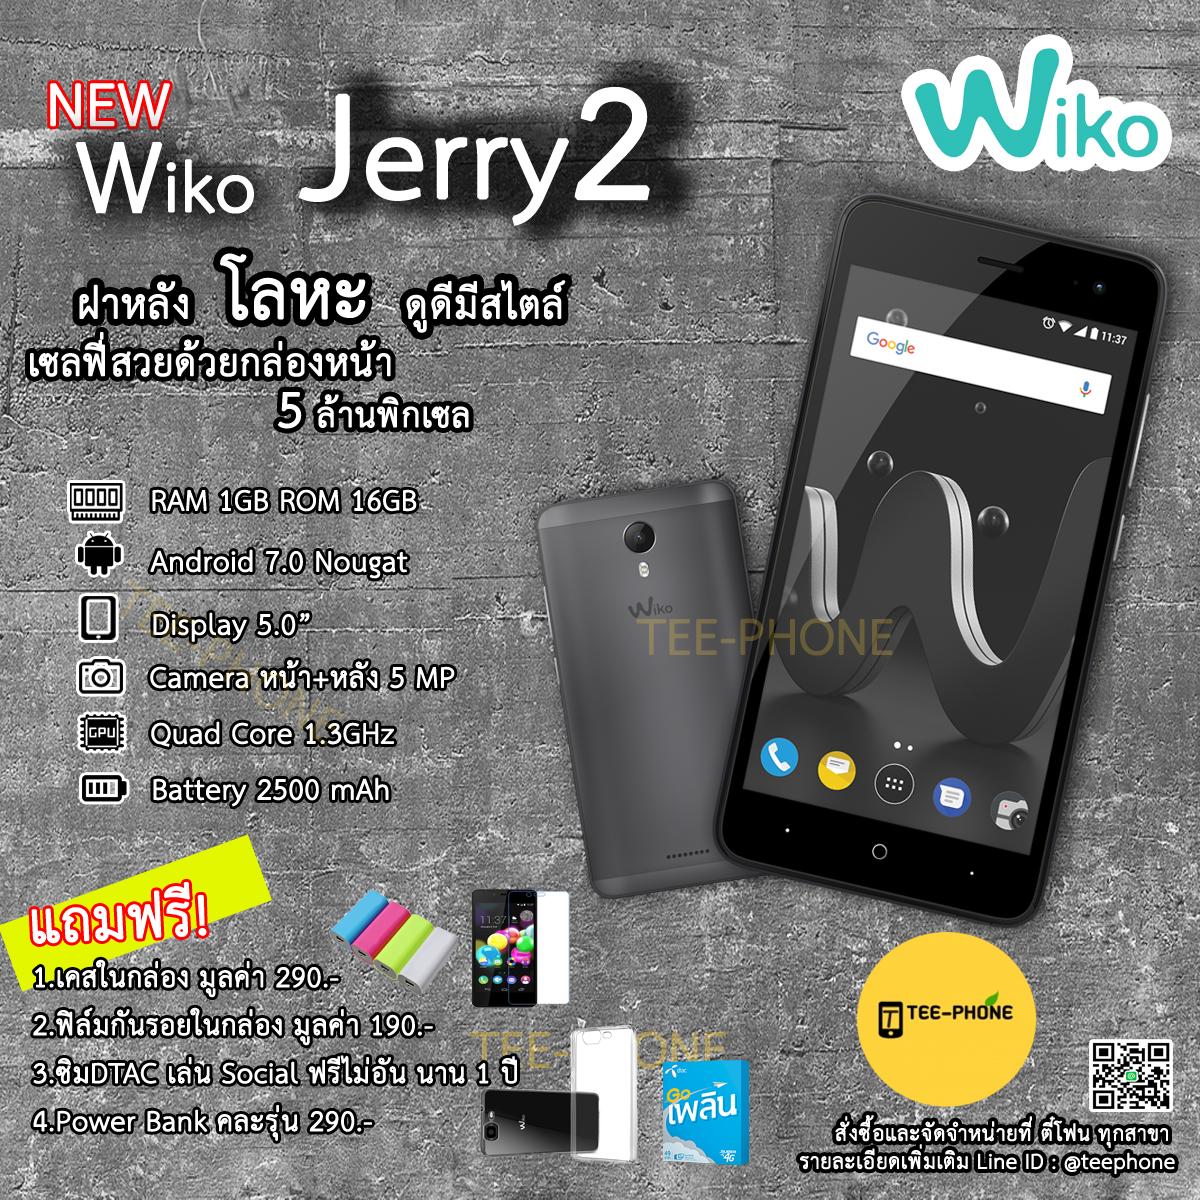 Wiko Jerry2 2017 (RAM1GB+ROM16GB) แถมเคส,ฟิล์มกันรอย,PowerBank,ซิมDtac